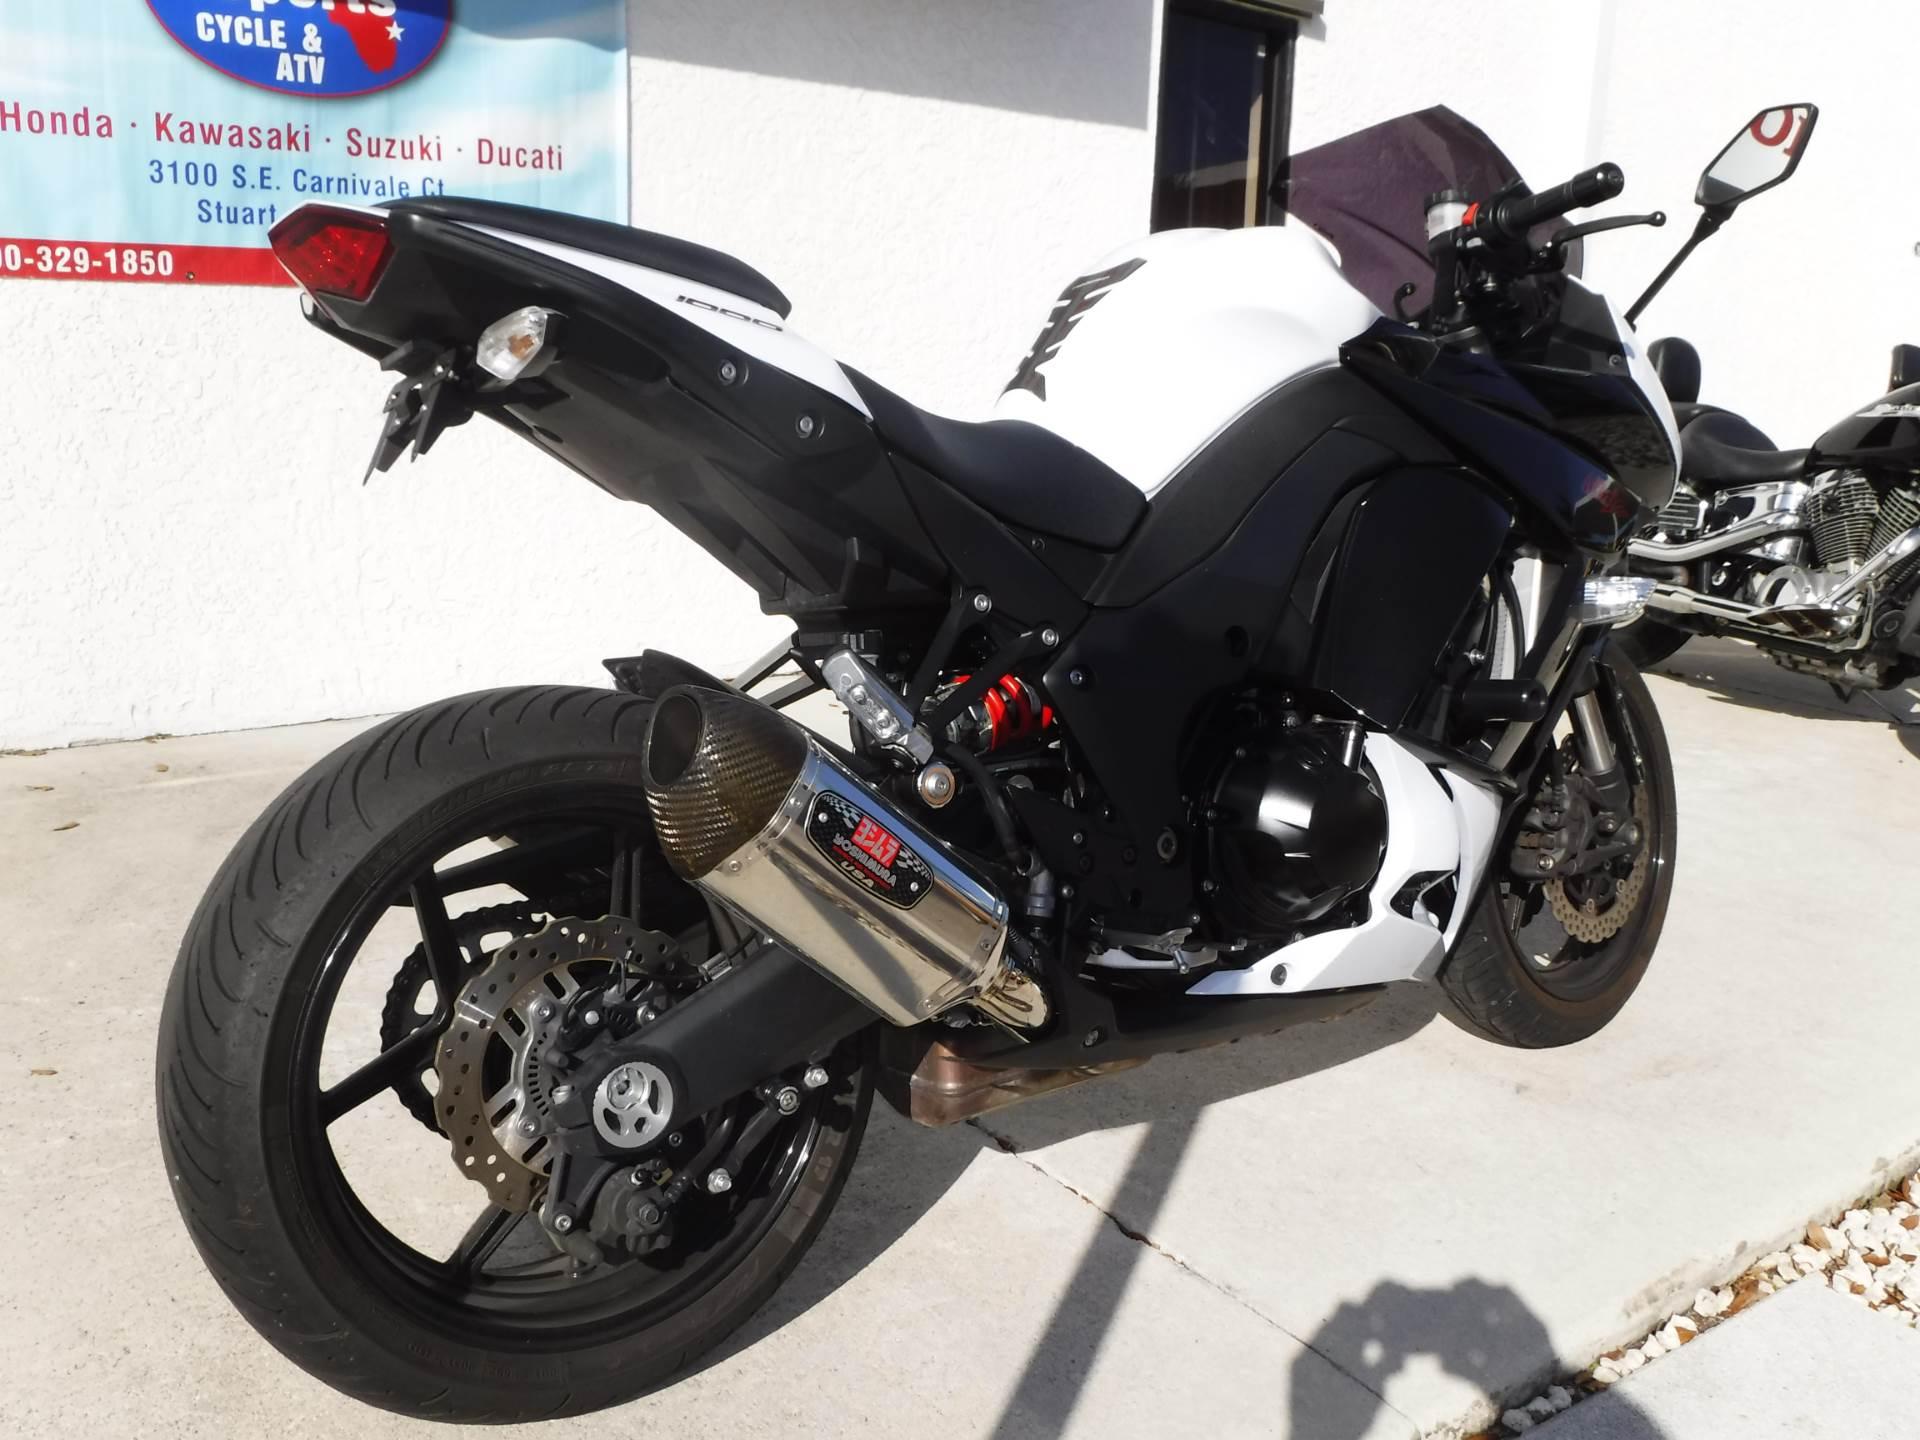 2013 Kawasaki Ninja® 1000 ABS in Stuart, Florida